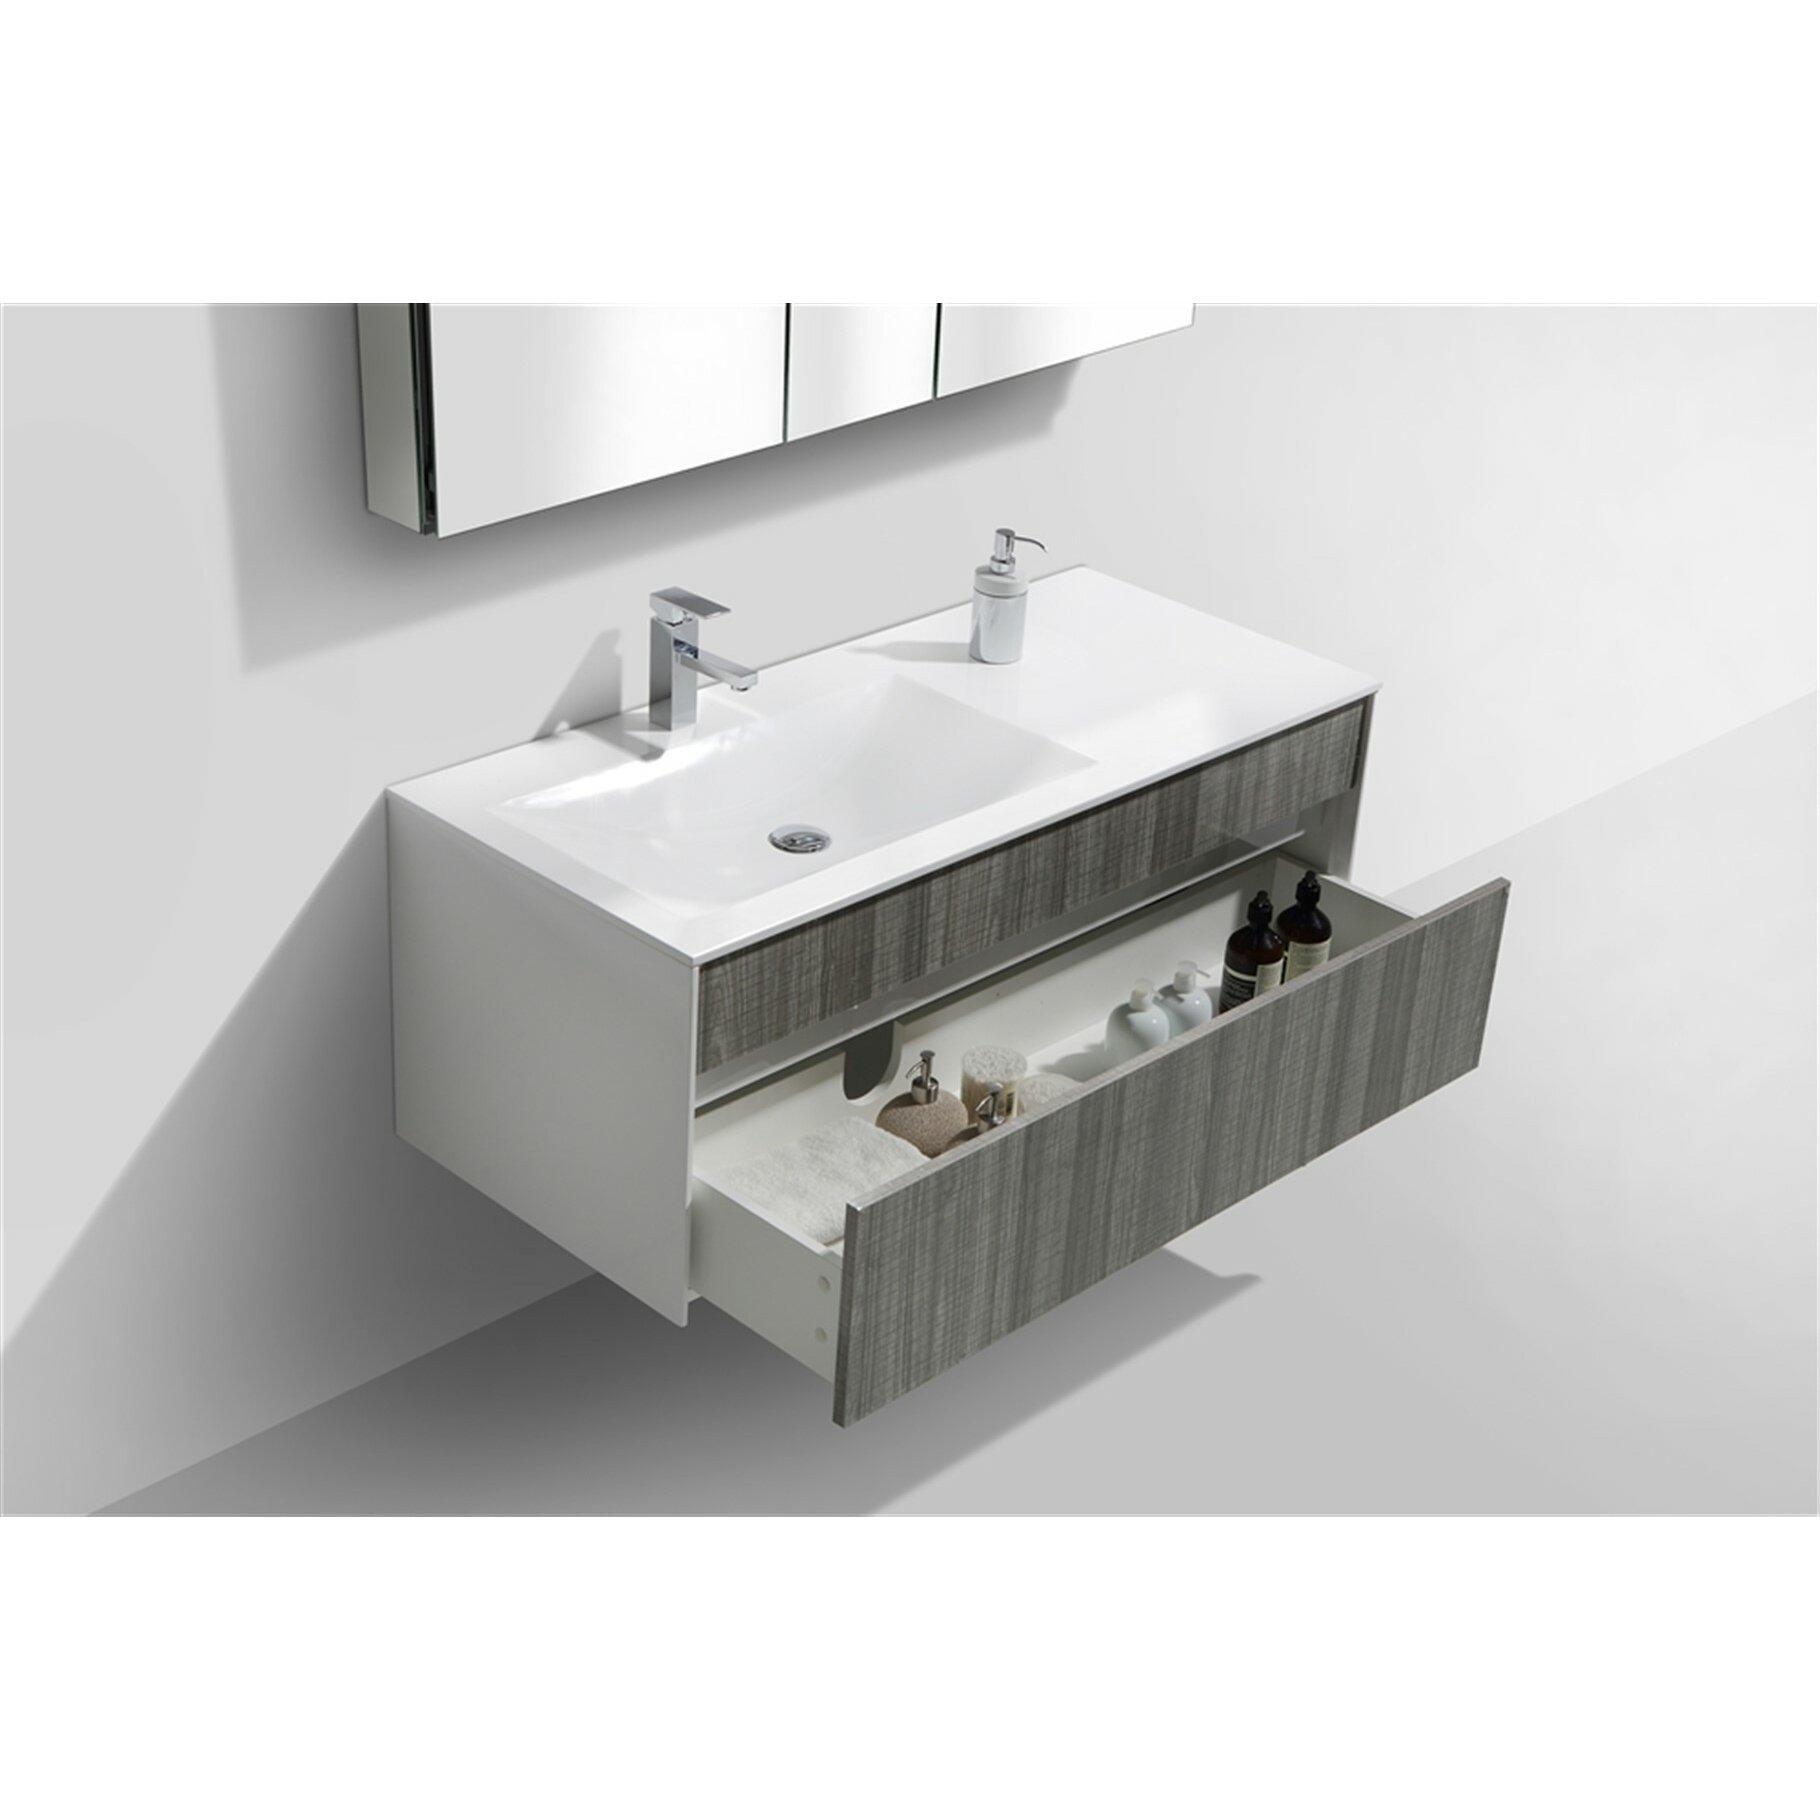 Kube bath tona fitto 48 single modern bathroom vanity set reviews wayfair - Linden modern bathroom vanity set ...